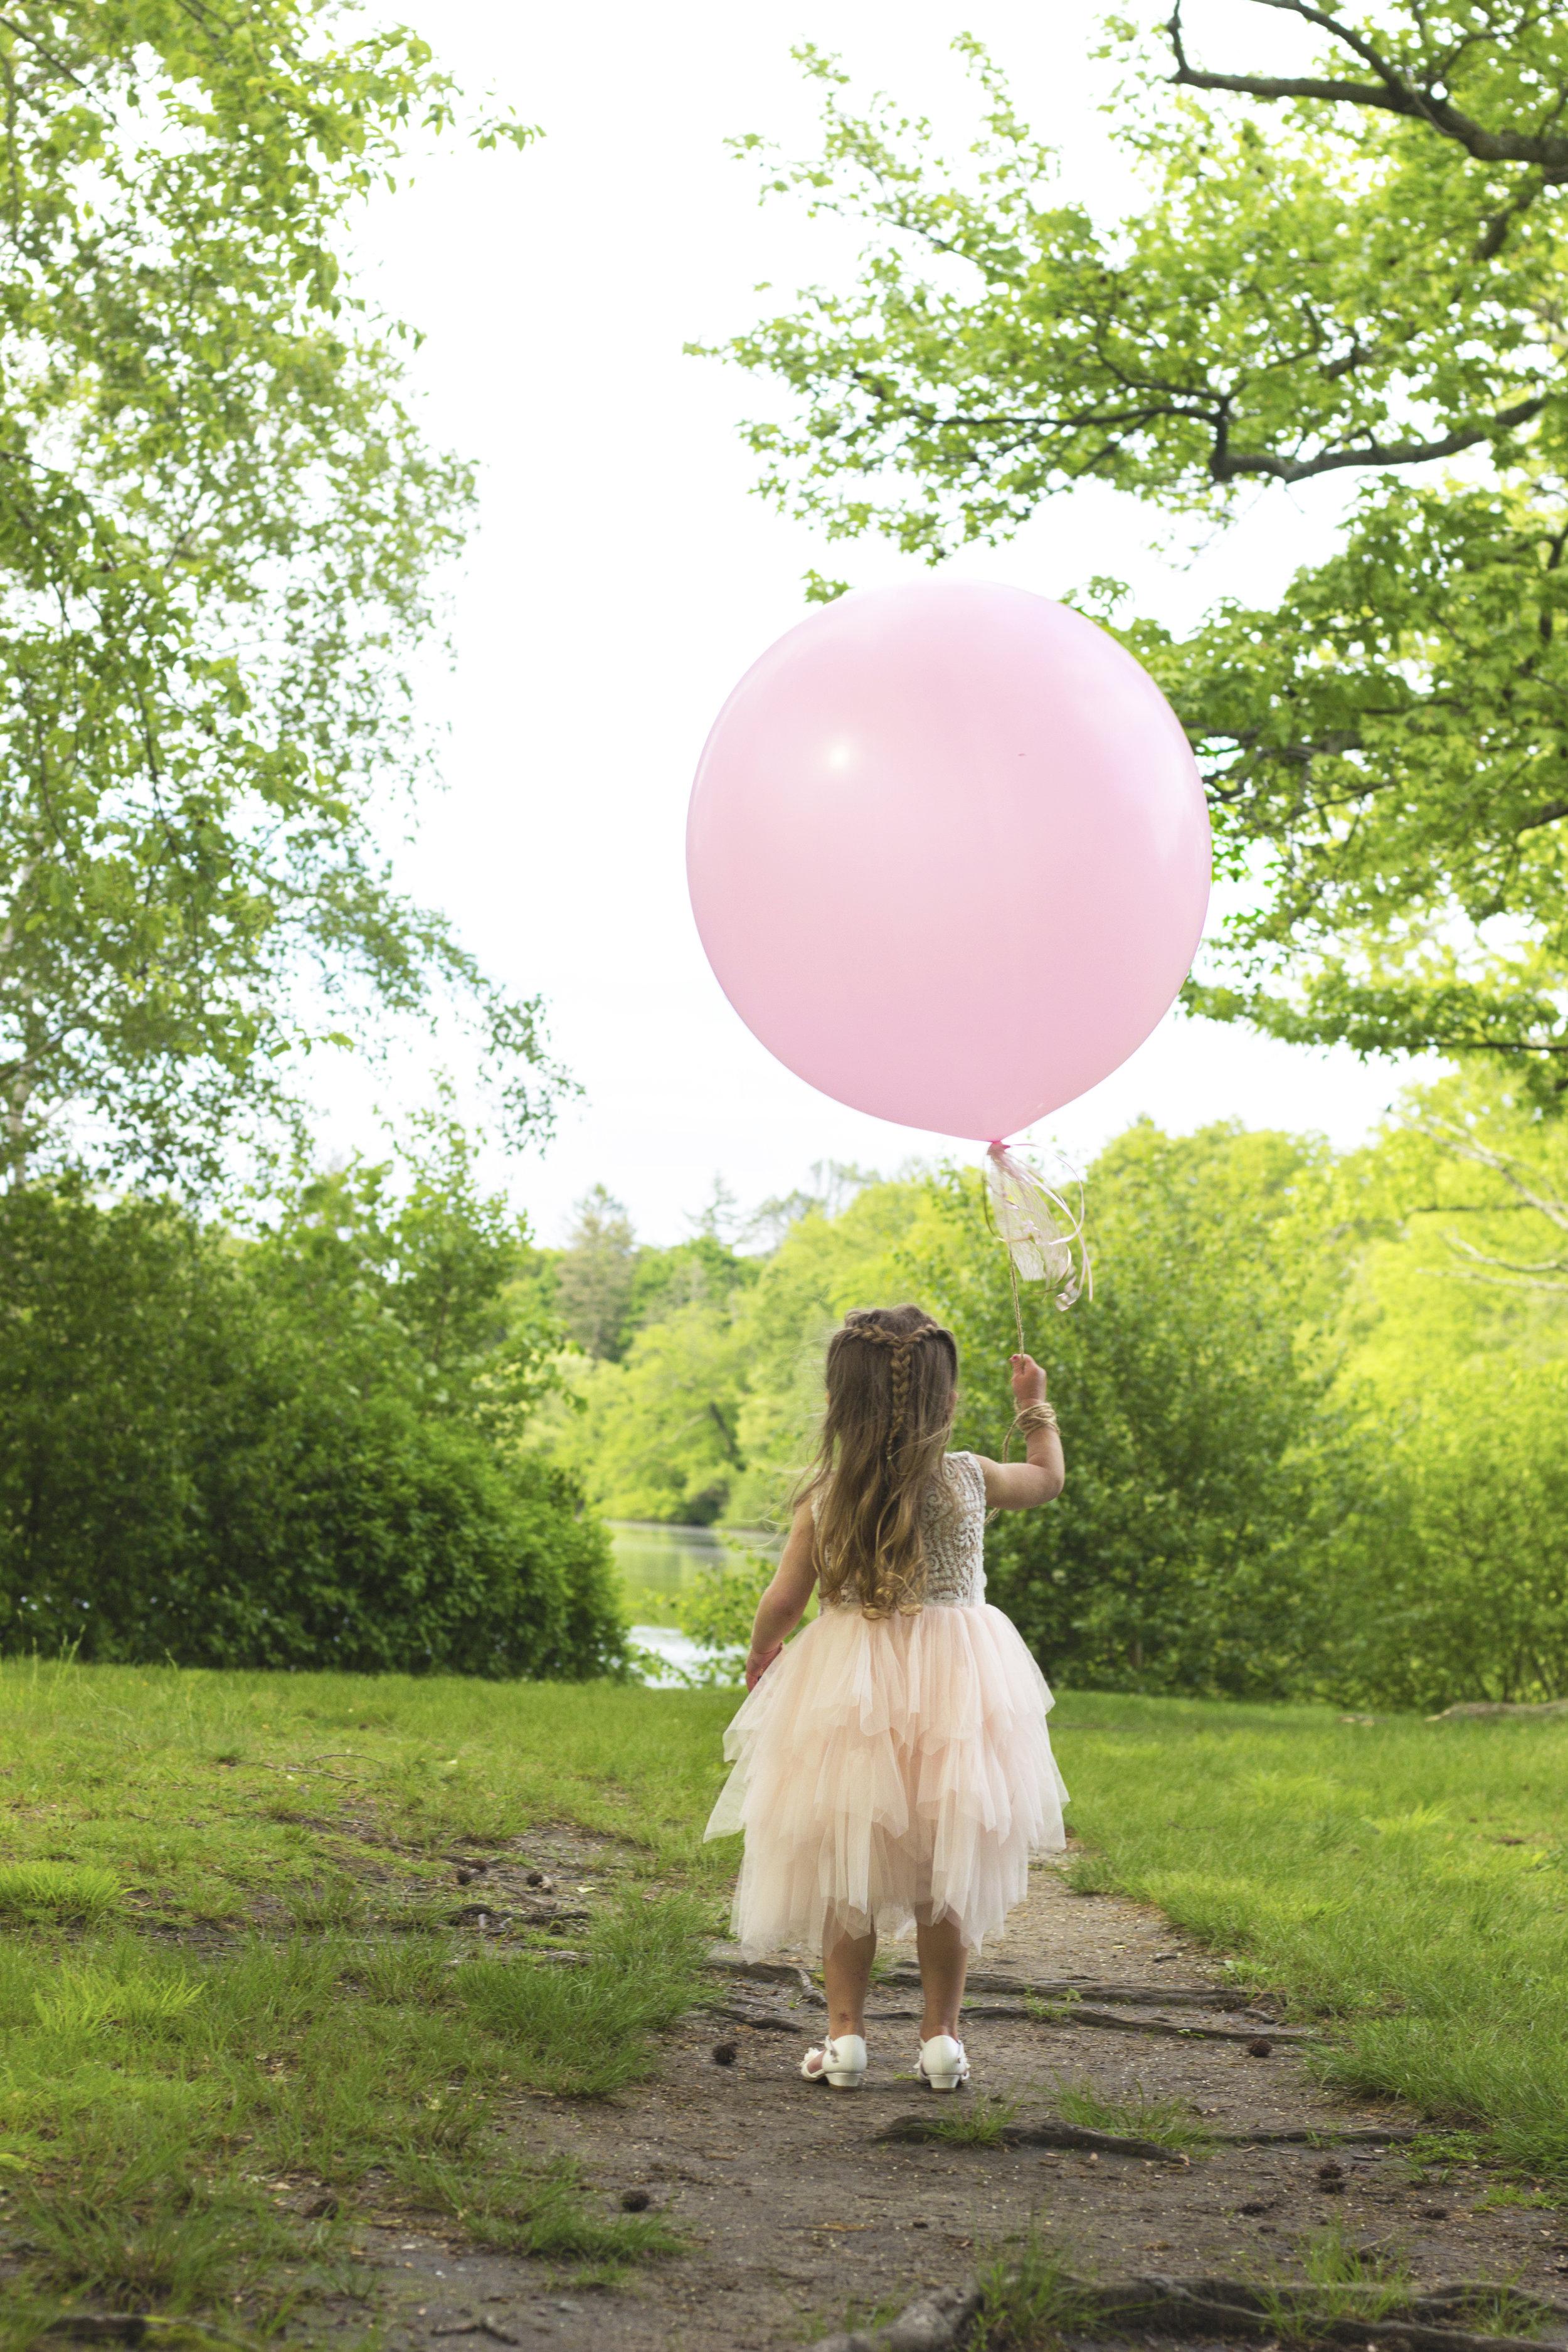 balloon1 copy.jpg